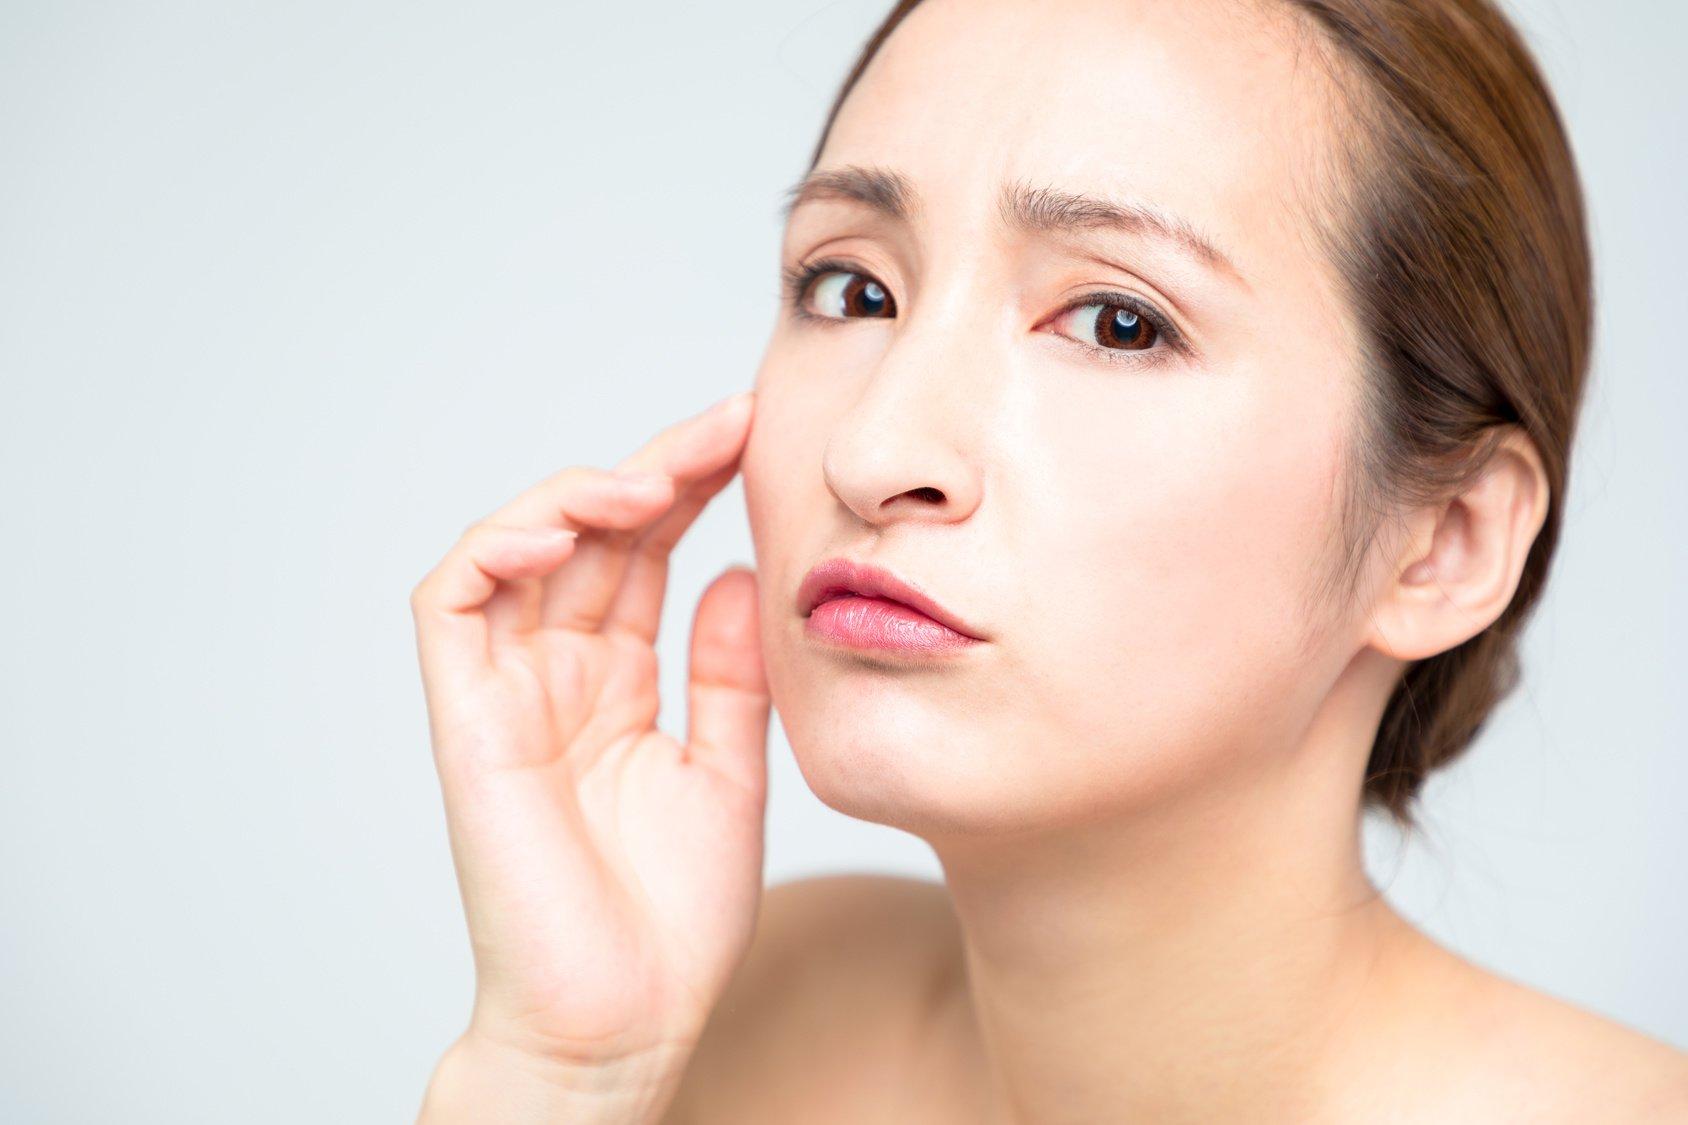 img 5a4cd4fca5533.png?resize=1200,630 - 敏感肌でも使える!おすすめの化粧水